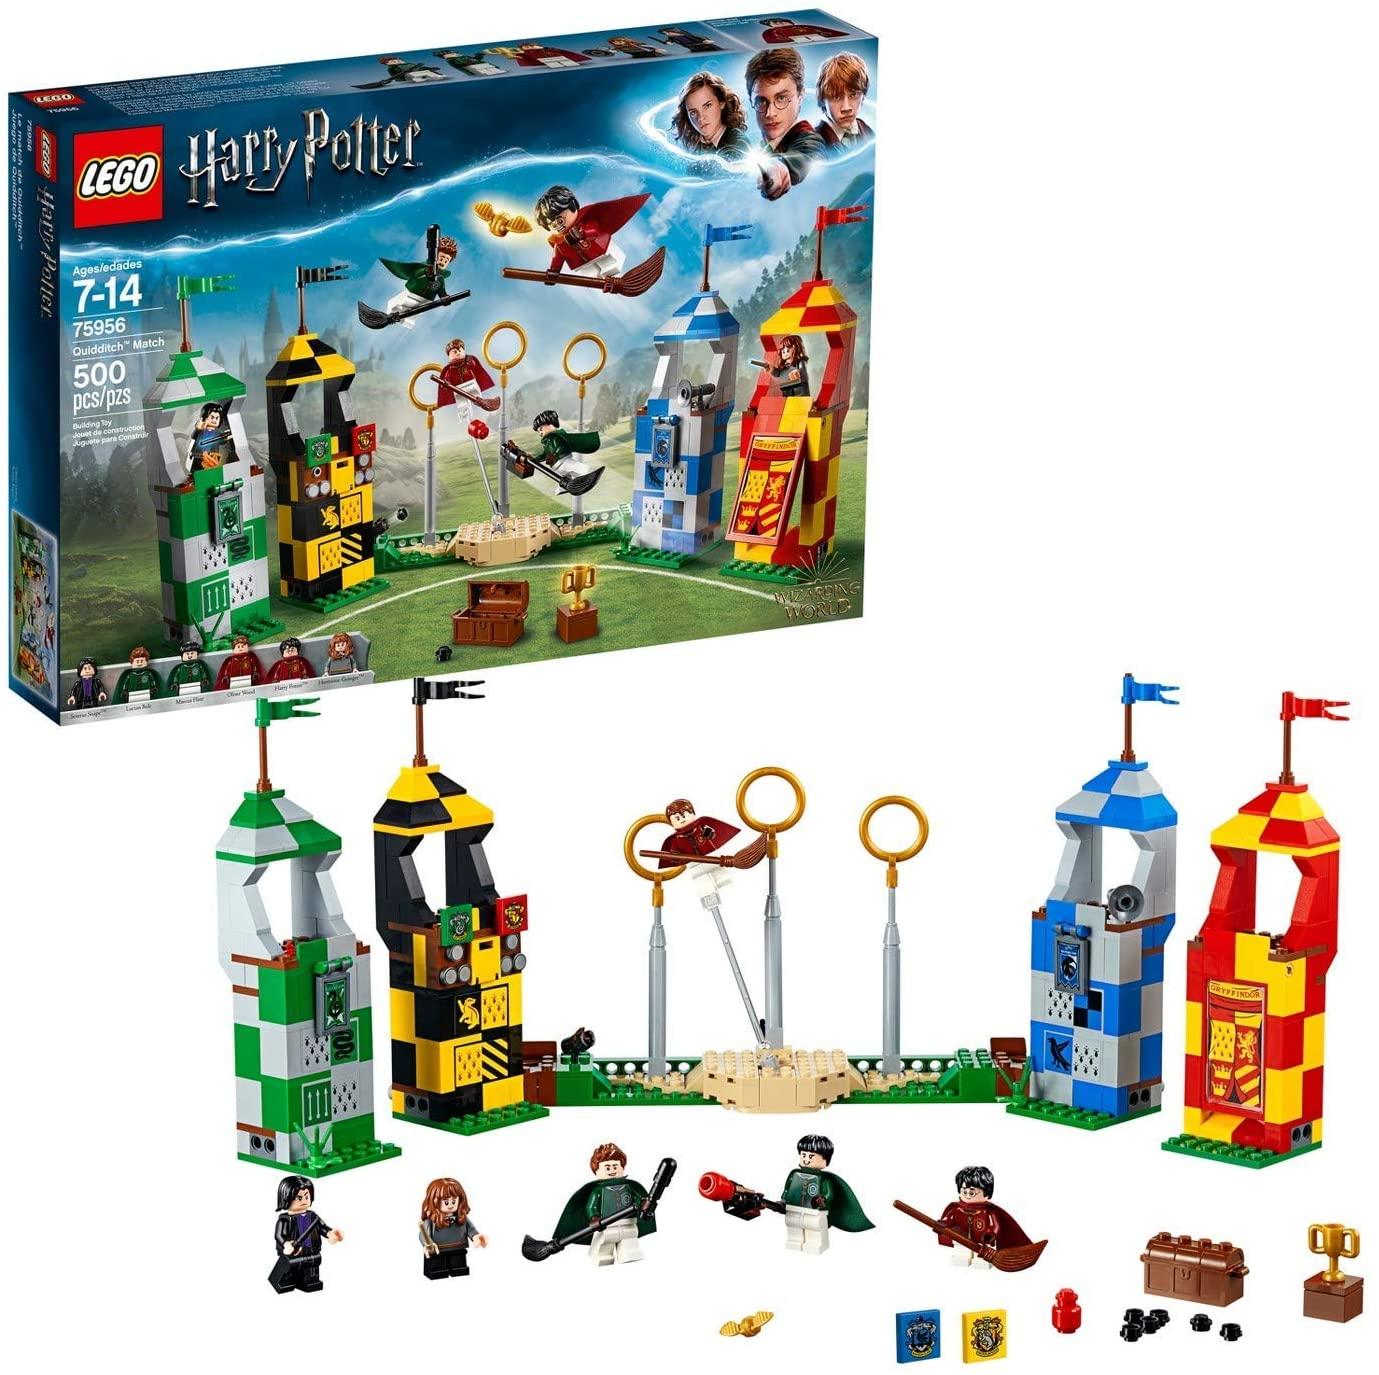 LEGO Harry Potter: Partido de Quidditch